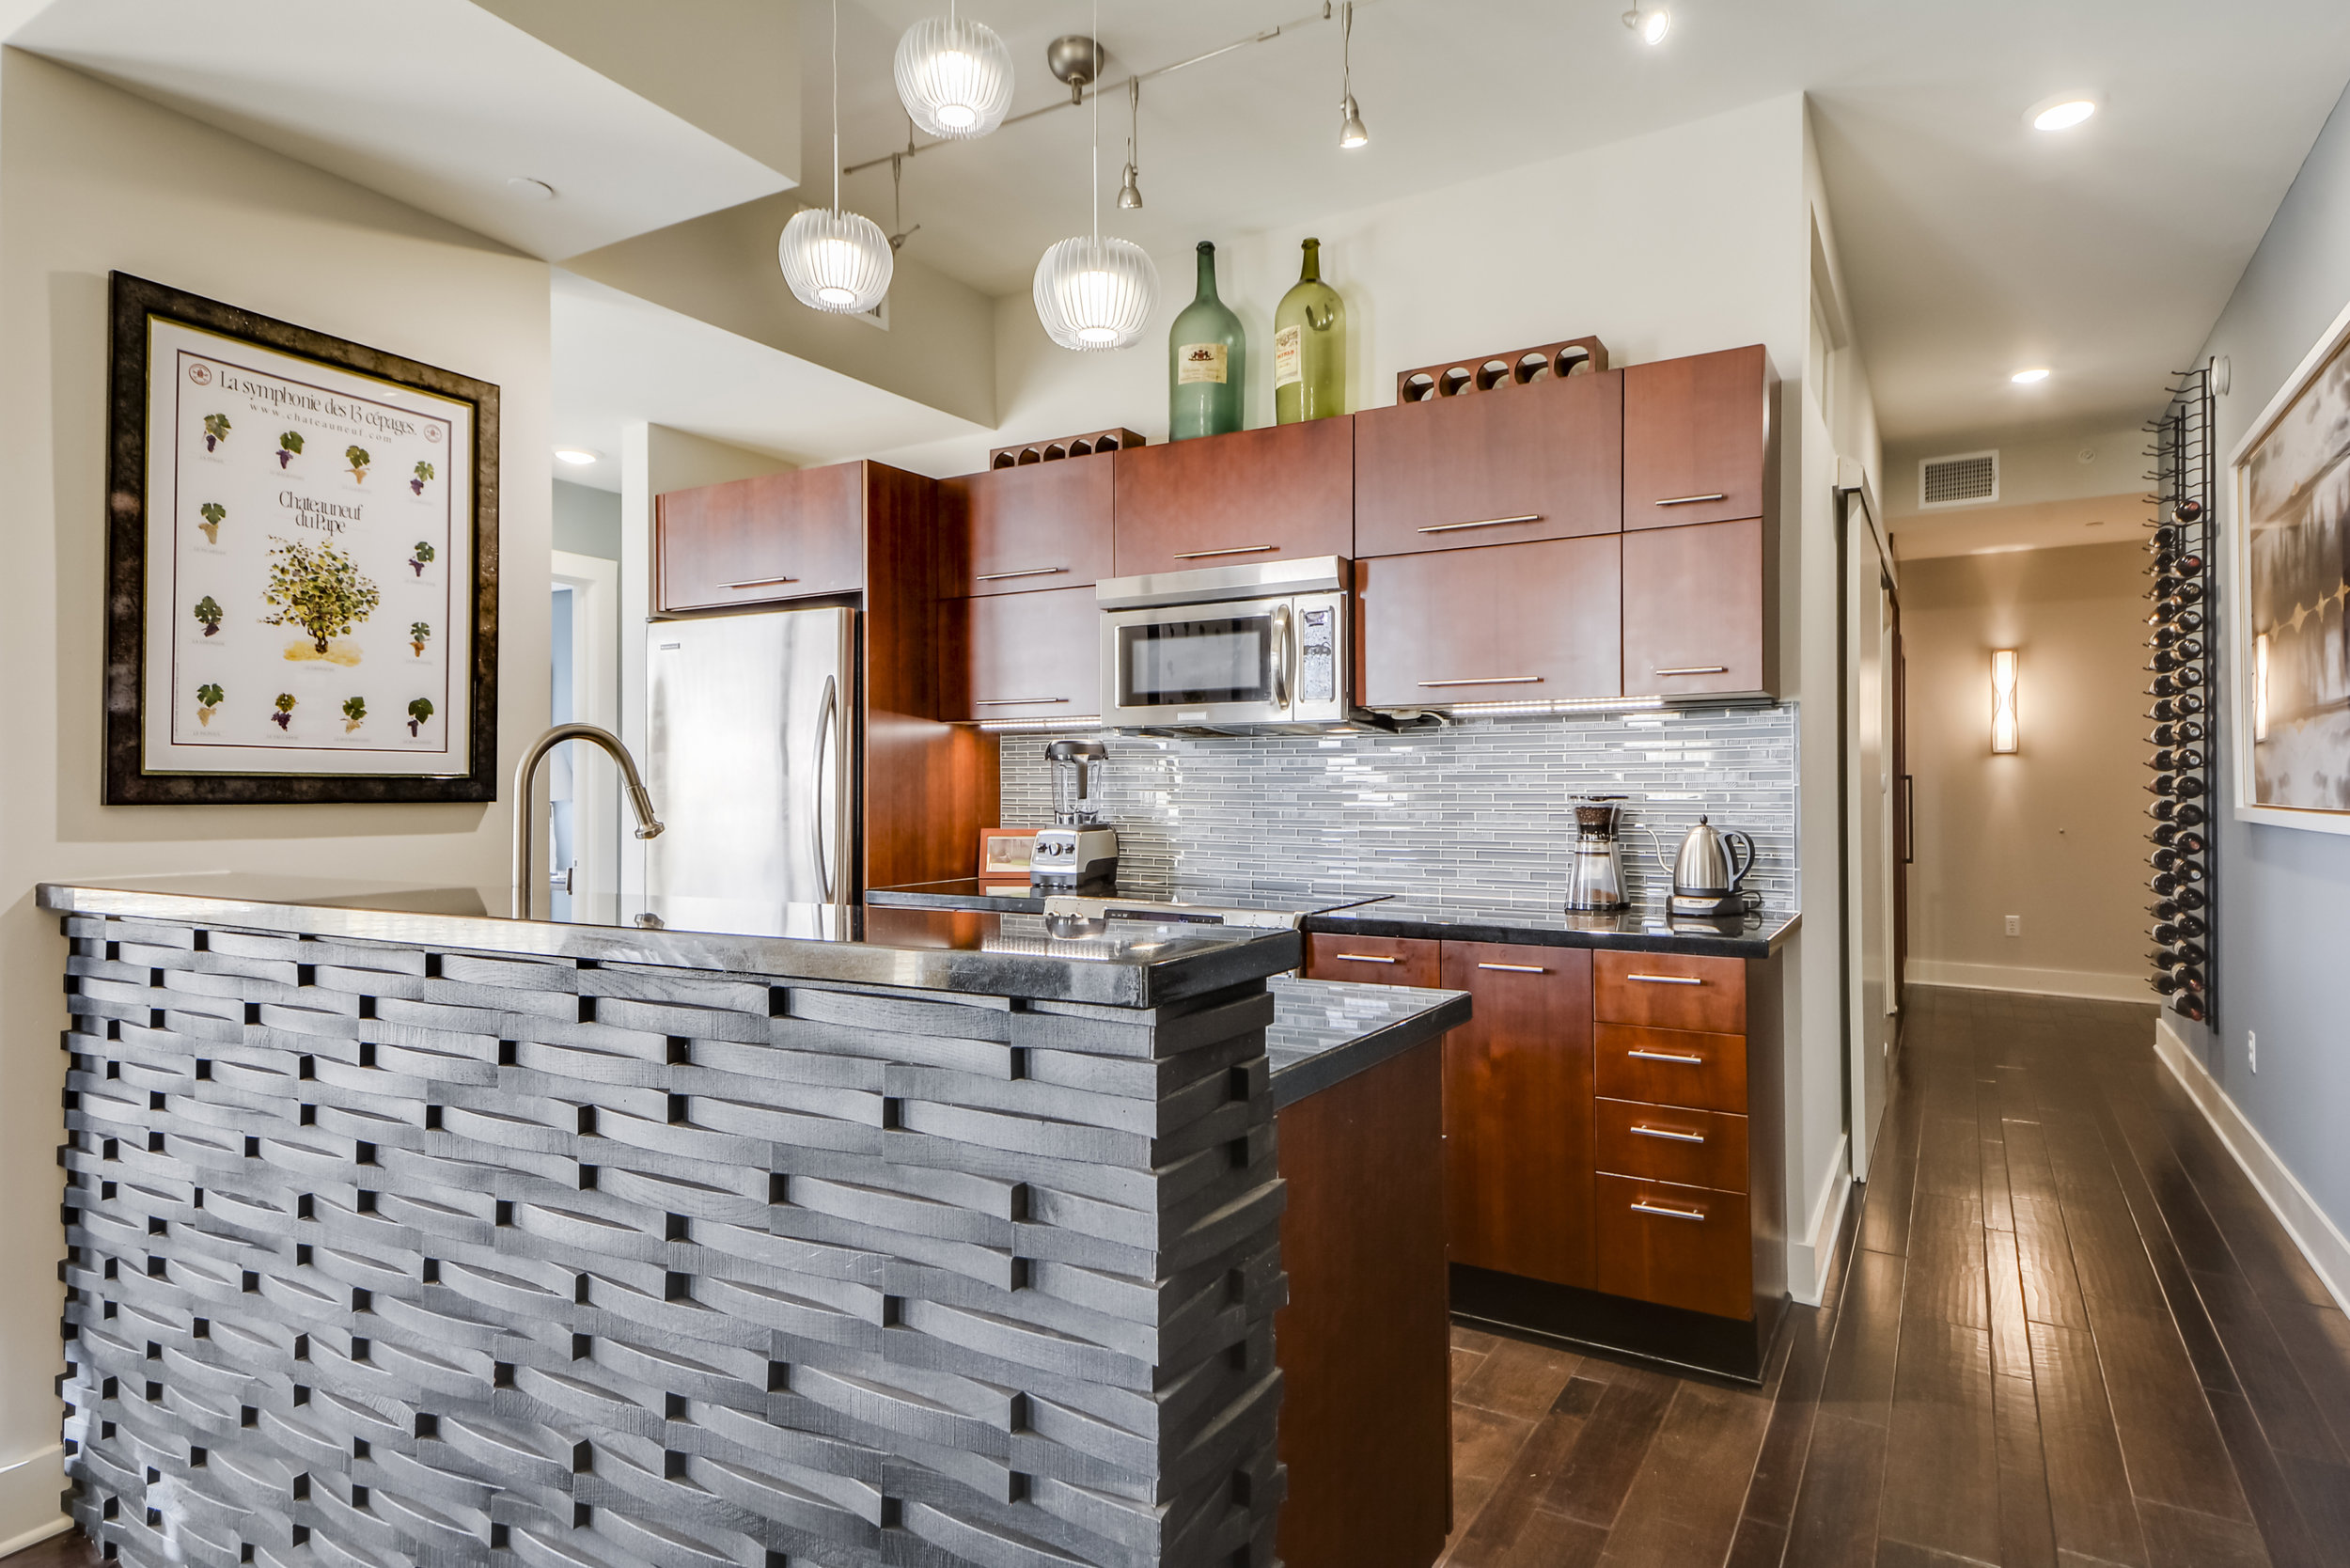 Transitional kitchen design with Glass mosaic backsplash